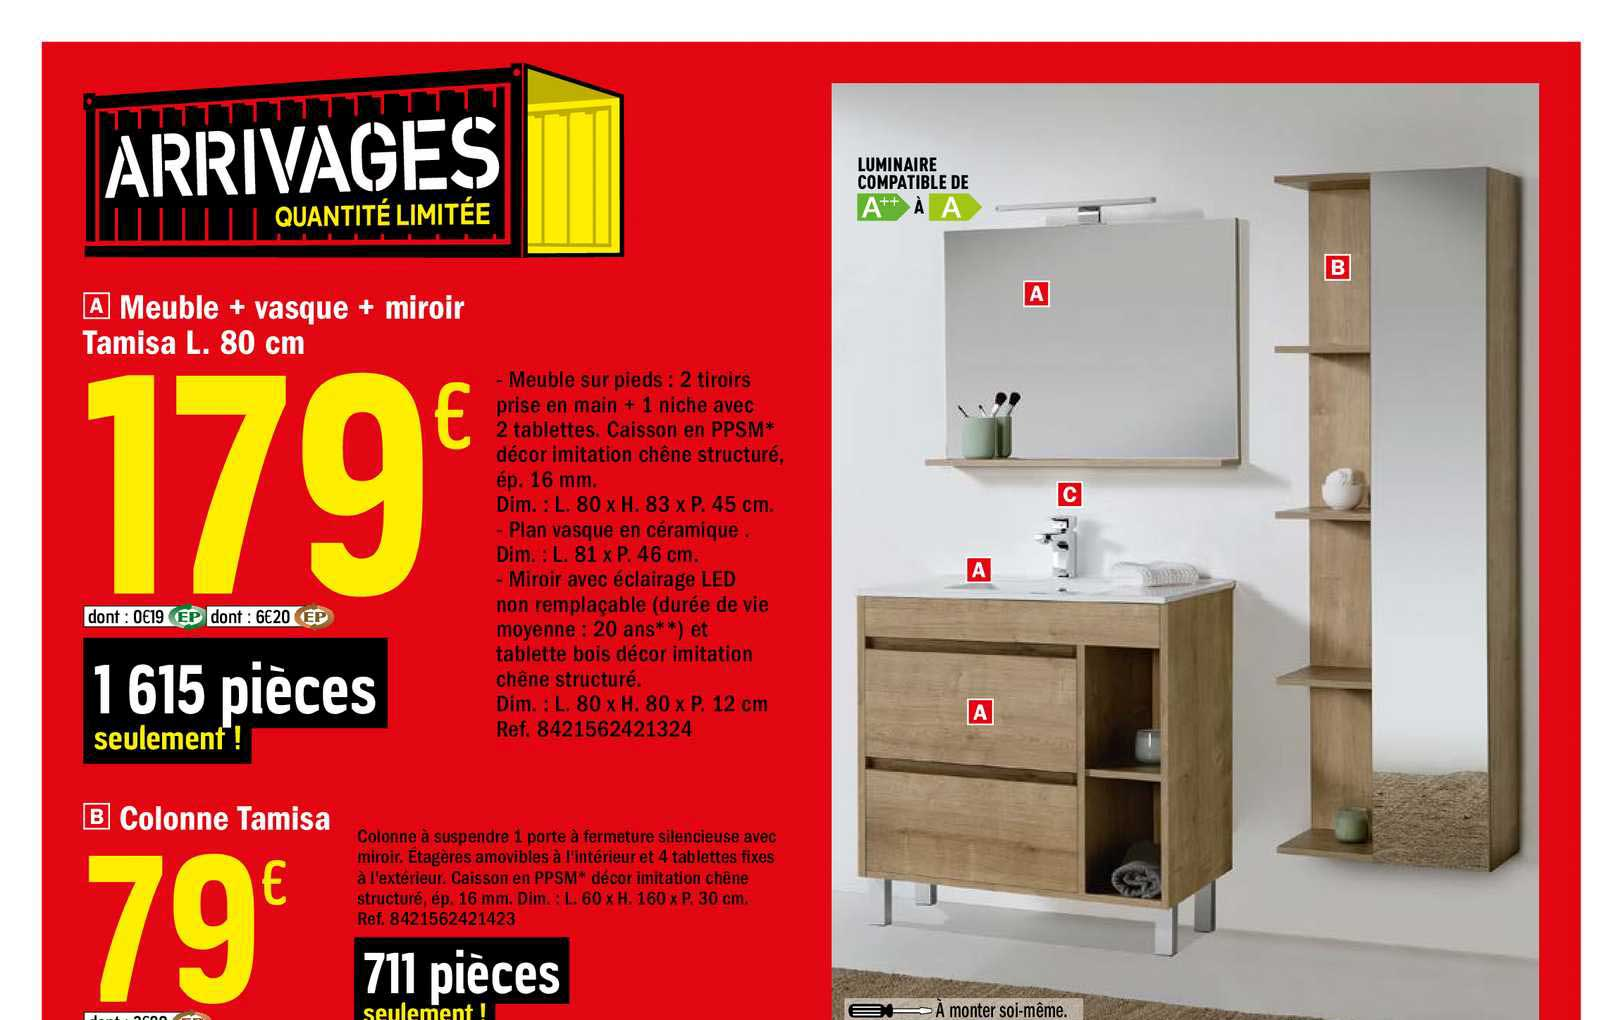 Catalogue Brico D Ef Bf Bdp C3 B4t Brico Depot Catalogue Septembre 2020 18 09 2020 Au 08 10